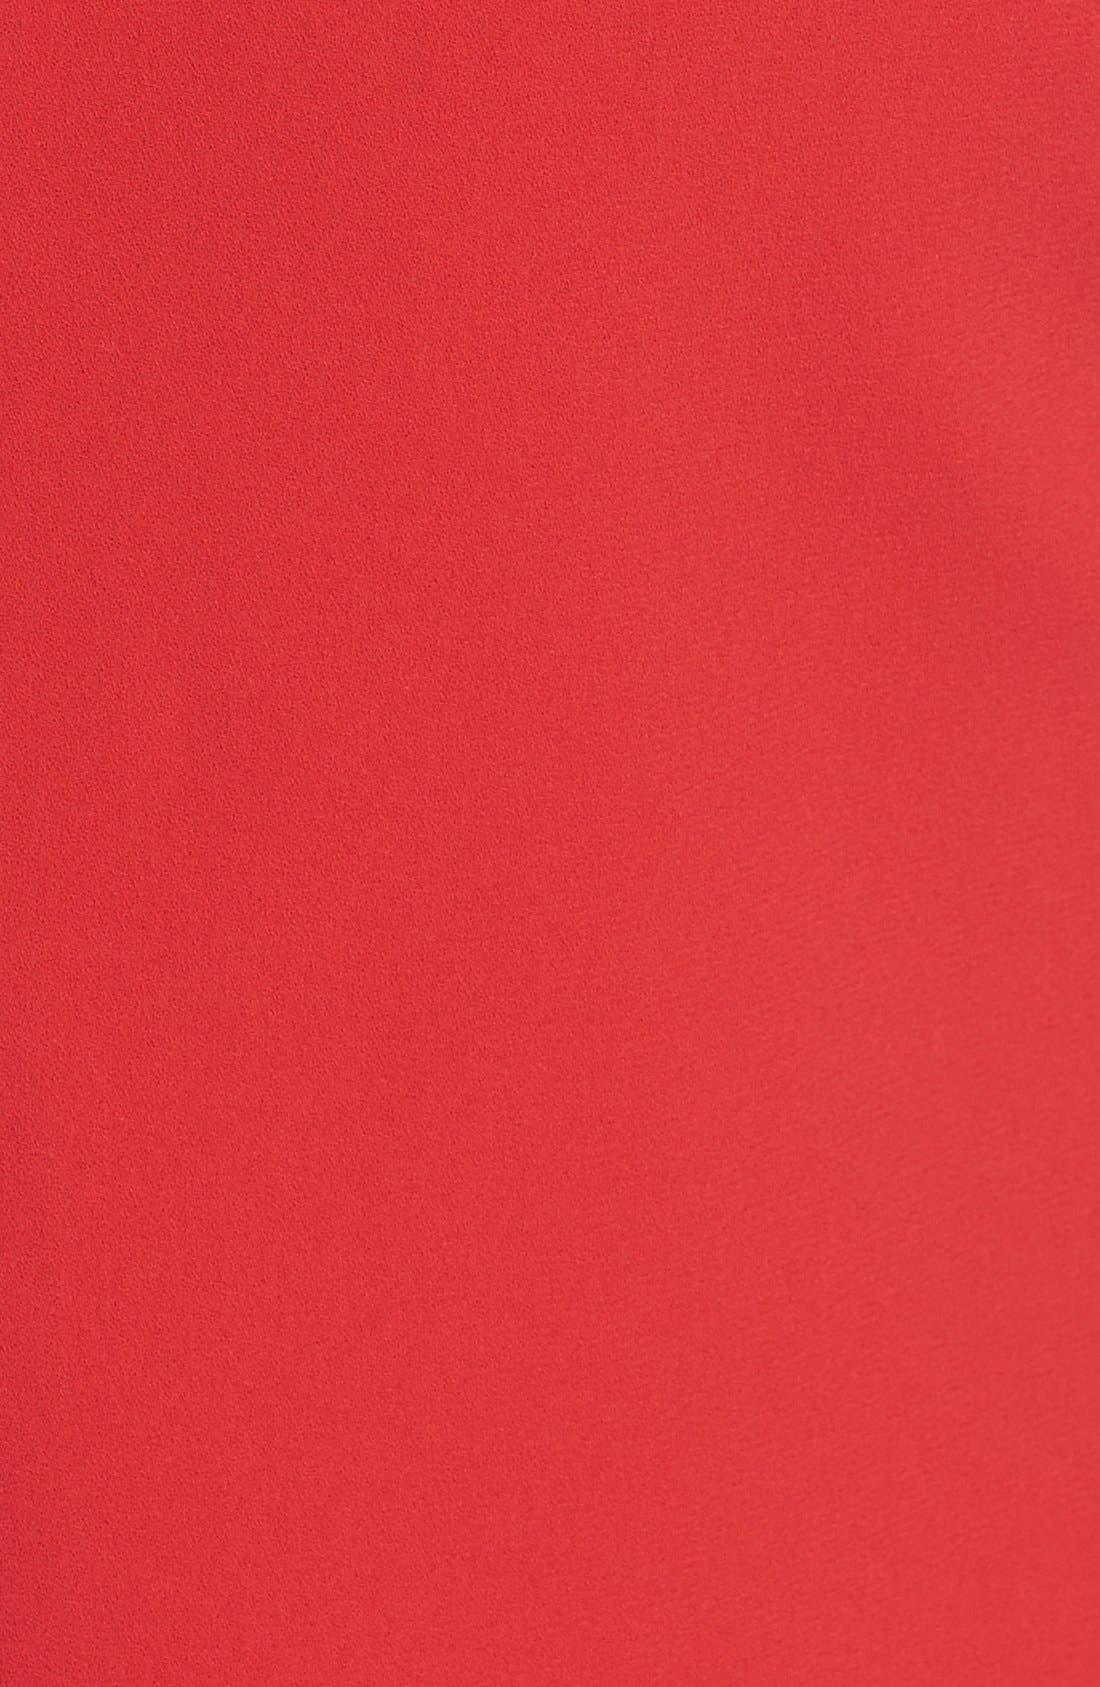 ALICE + OLIVIA,                             'Coley' Mock Neck A-Line Dress,                             Alternate thumbnail 3, color,                             623